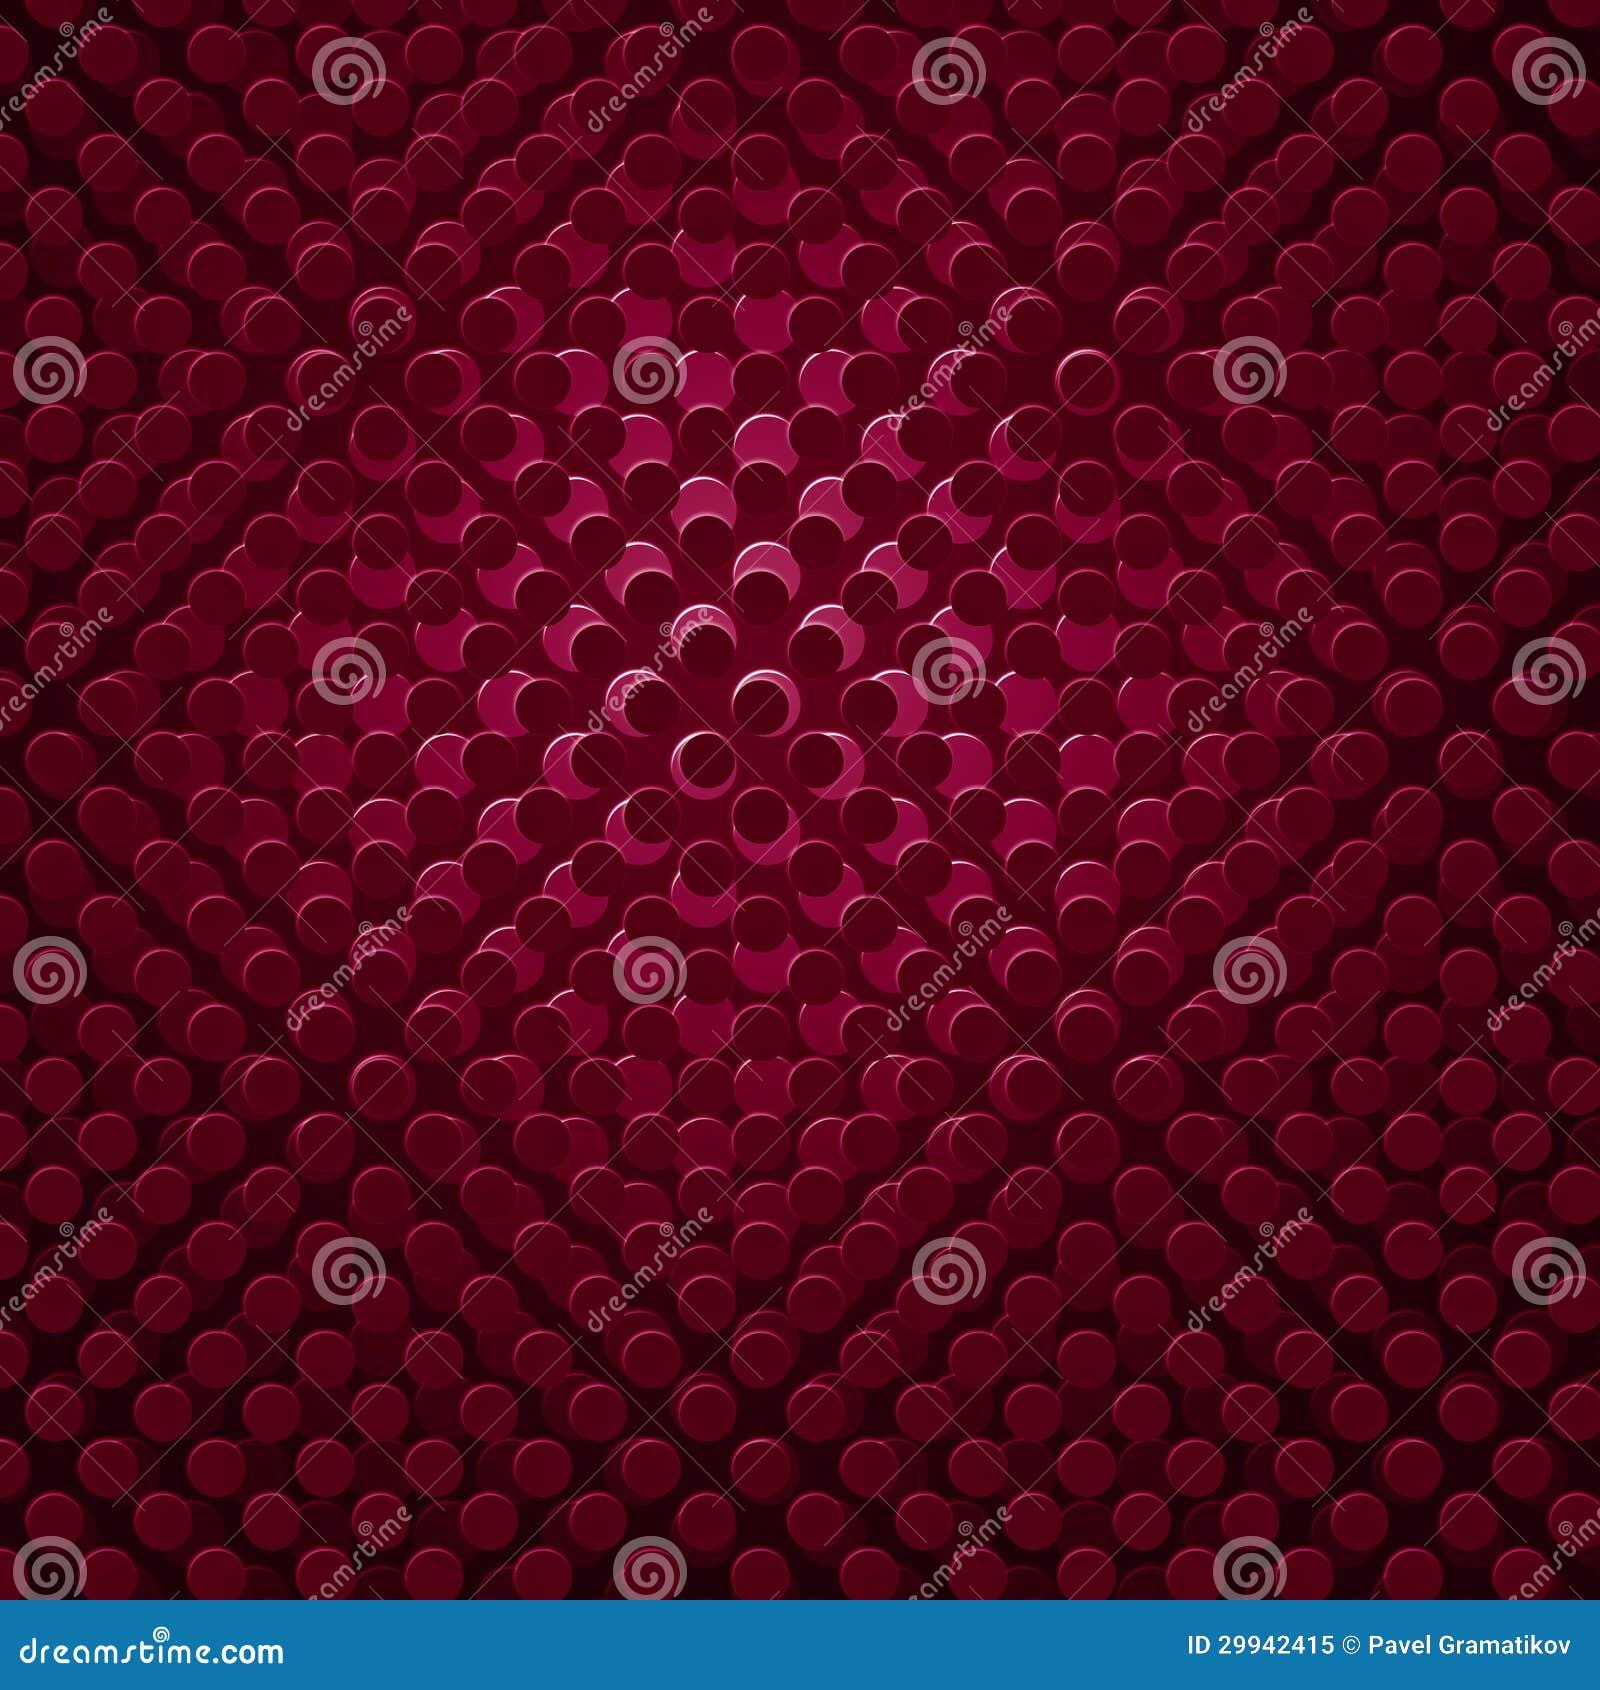 elegant bordeaux background royalty free stock photo image 29942415. Black Bedroom Furniture Sets. Home Design Ideas